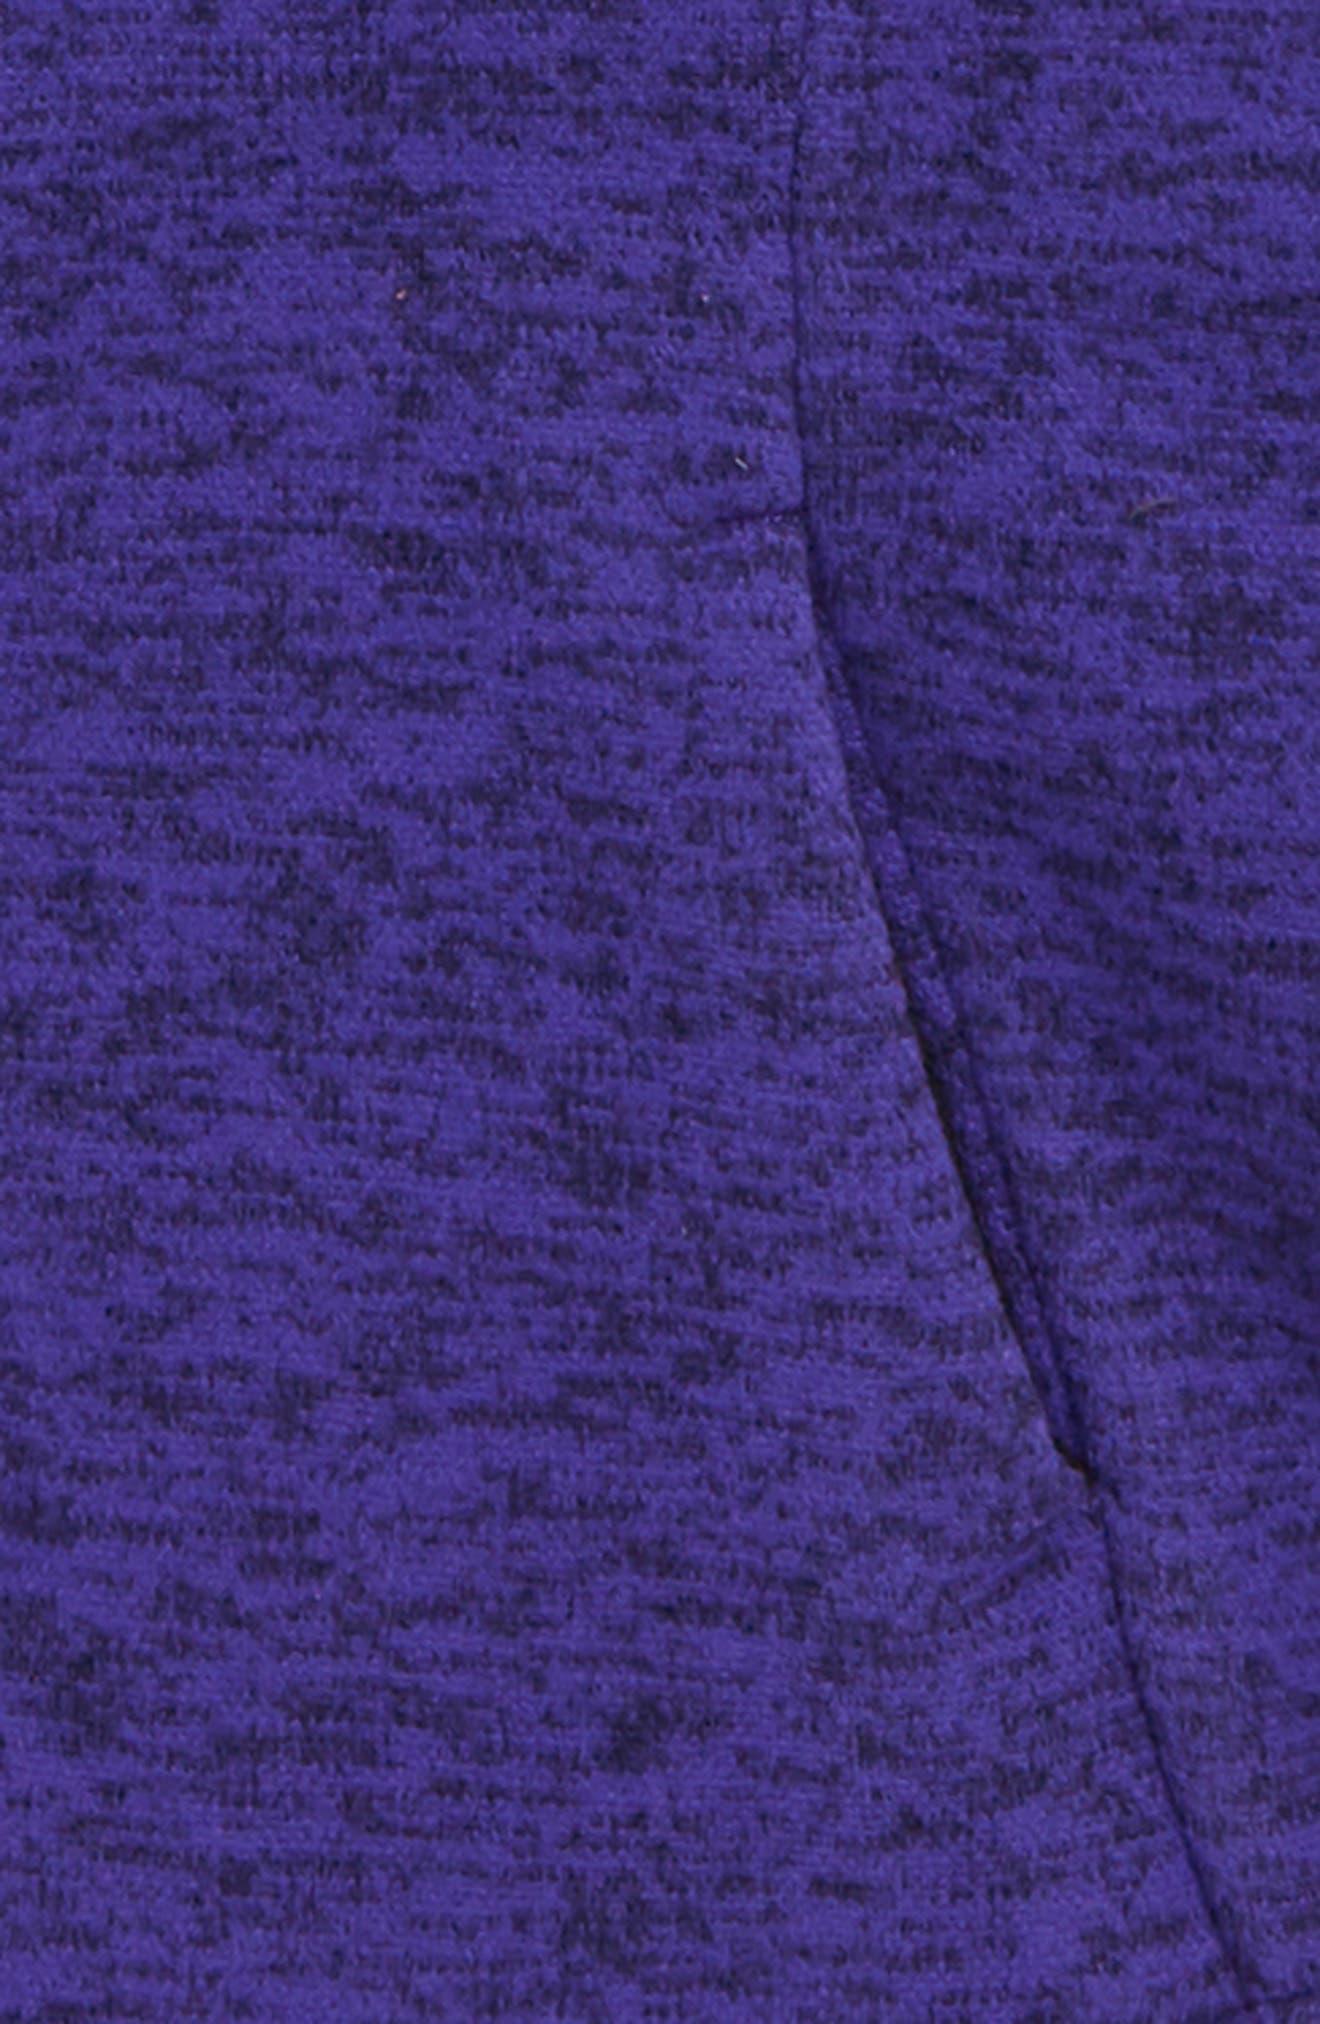 Indi Fleece Jacket,                             Alternate thumbnail 2, color,                             DEEP BLUE HEATHER